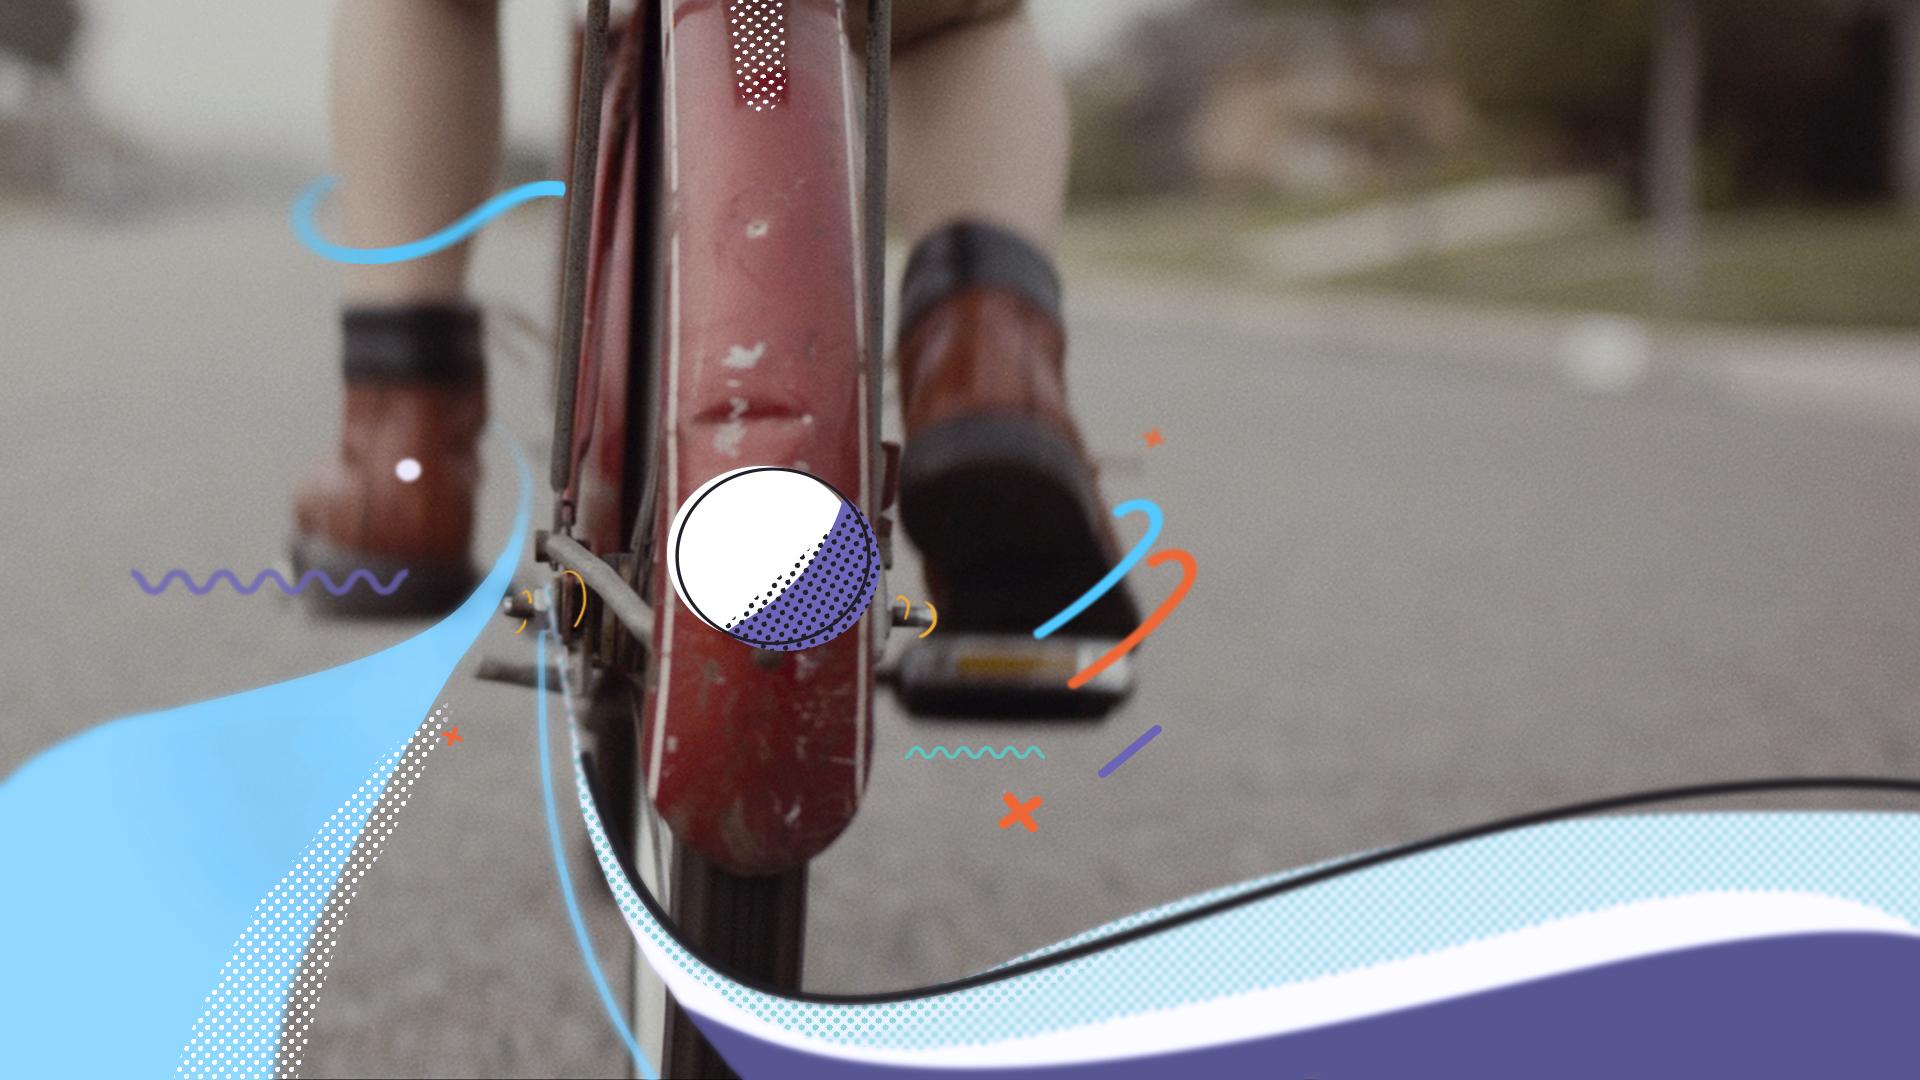 Bike_Live_Action_Graphics_v03(Blur).jpg